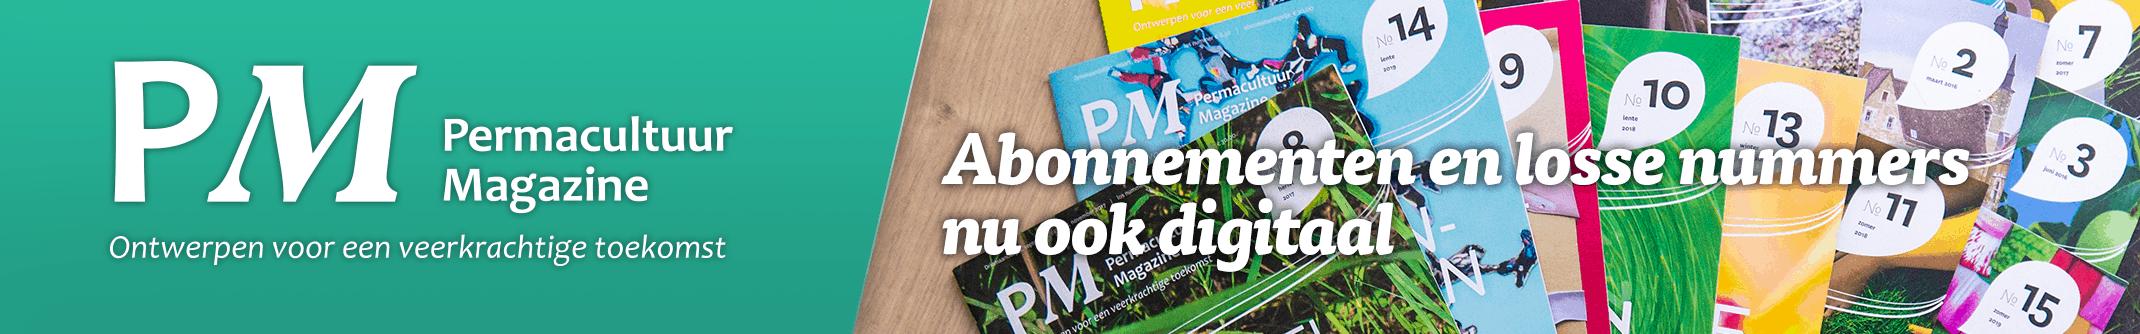 Permacultuur Magazine-winkel